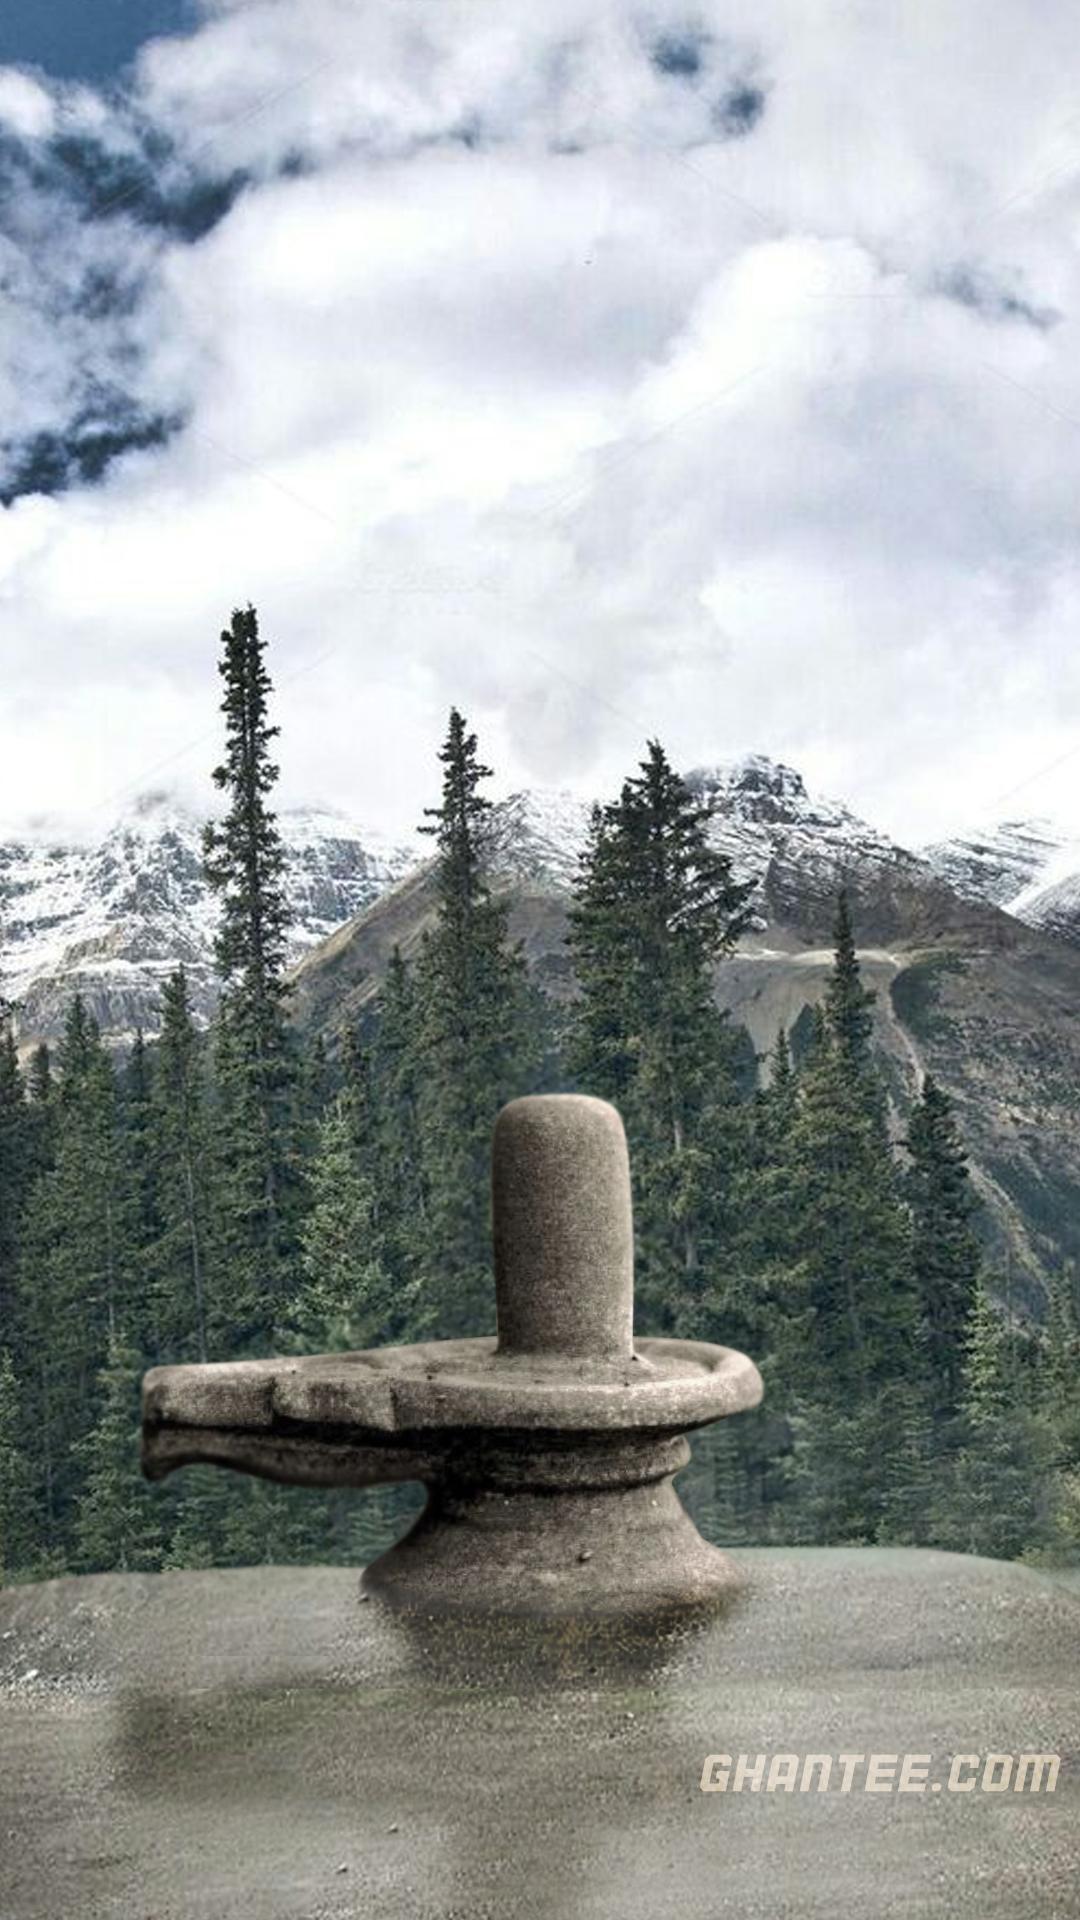 shivling scenery hd phone background